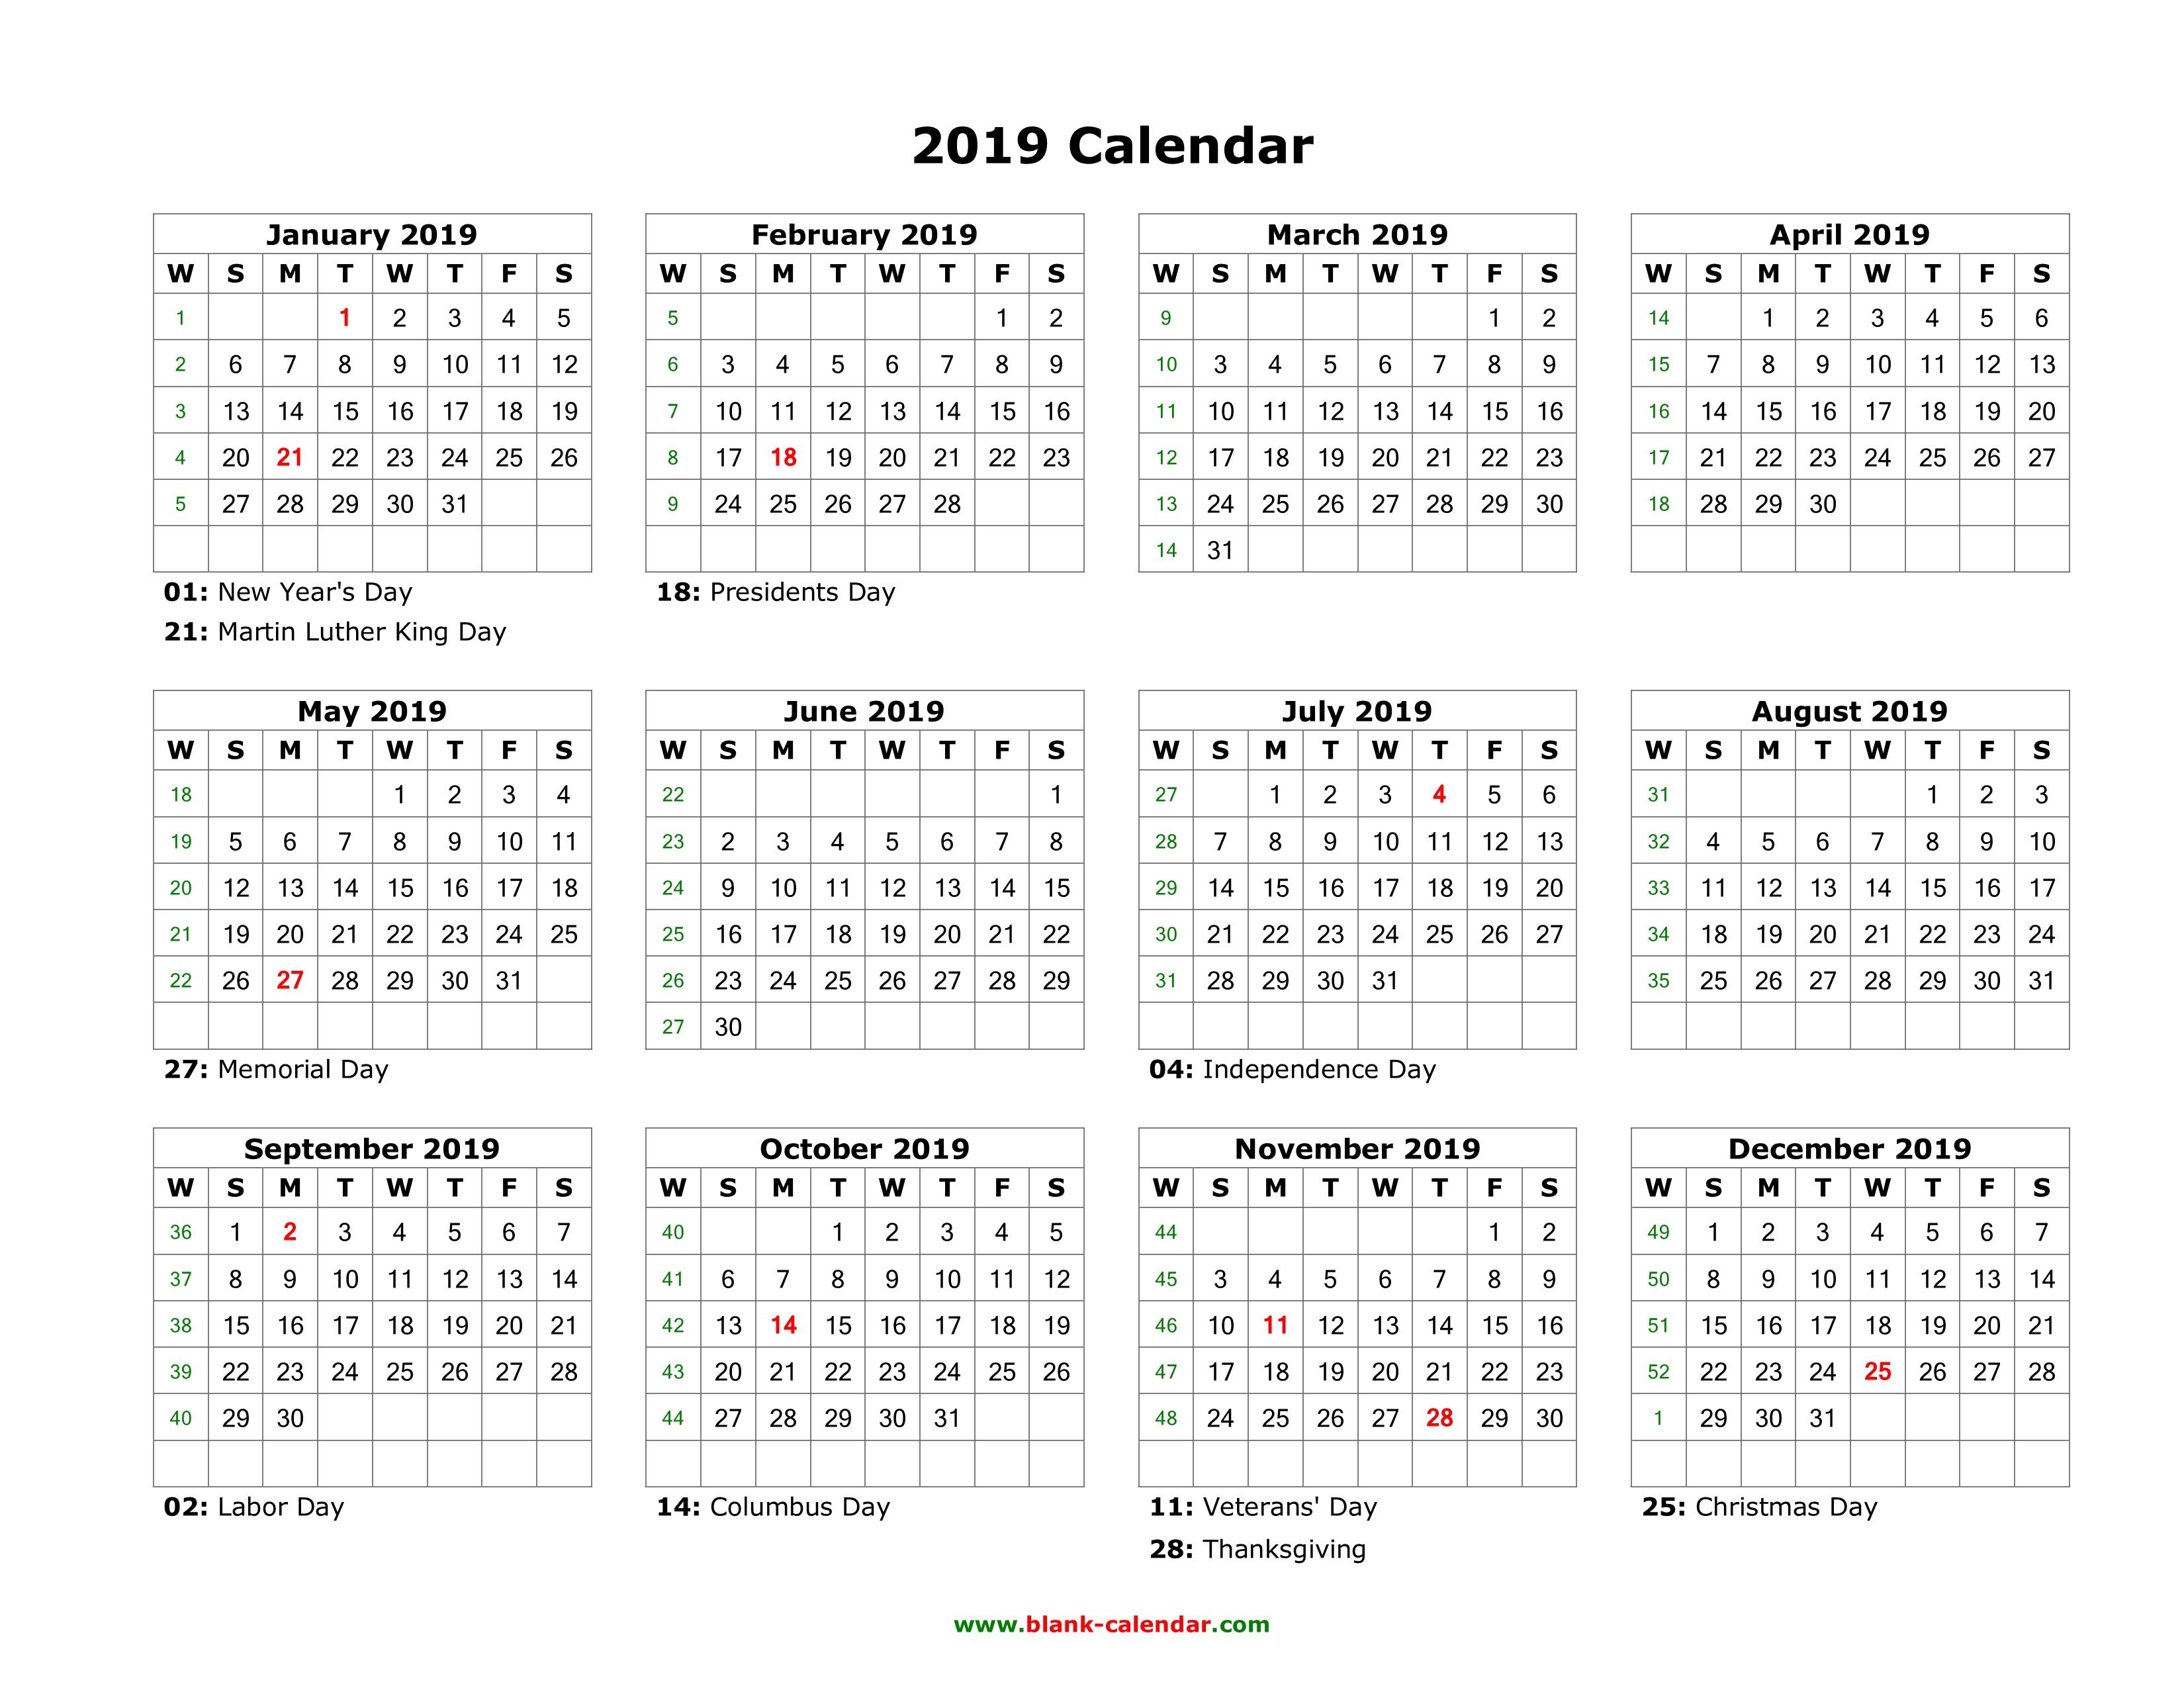 Printable Calendar Year 2019 | Printable Calendar 2019 intended for Blank Calender Academic Year 2019 -2020